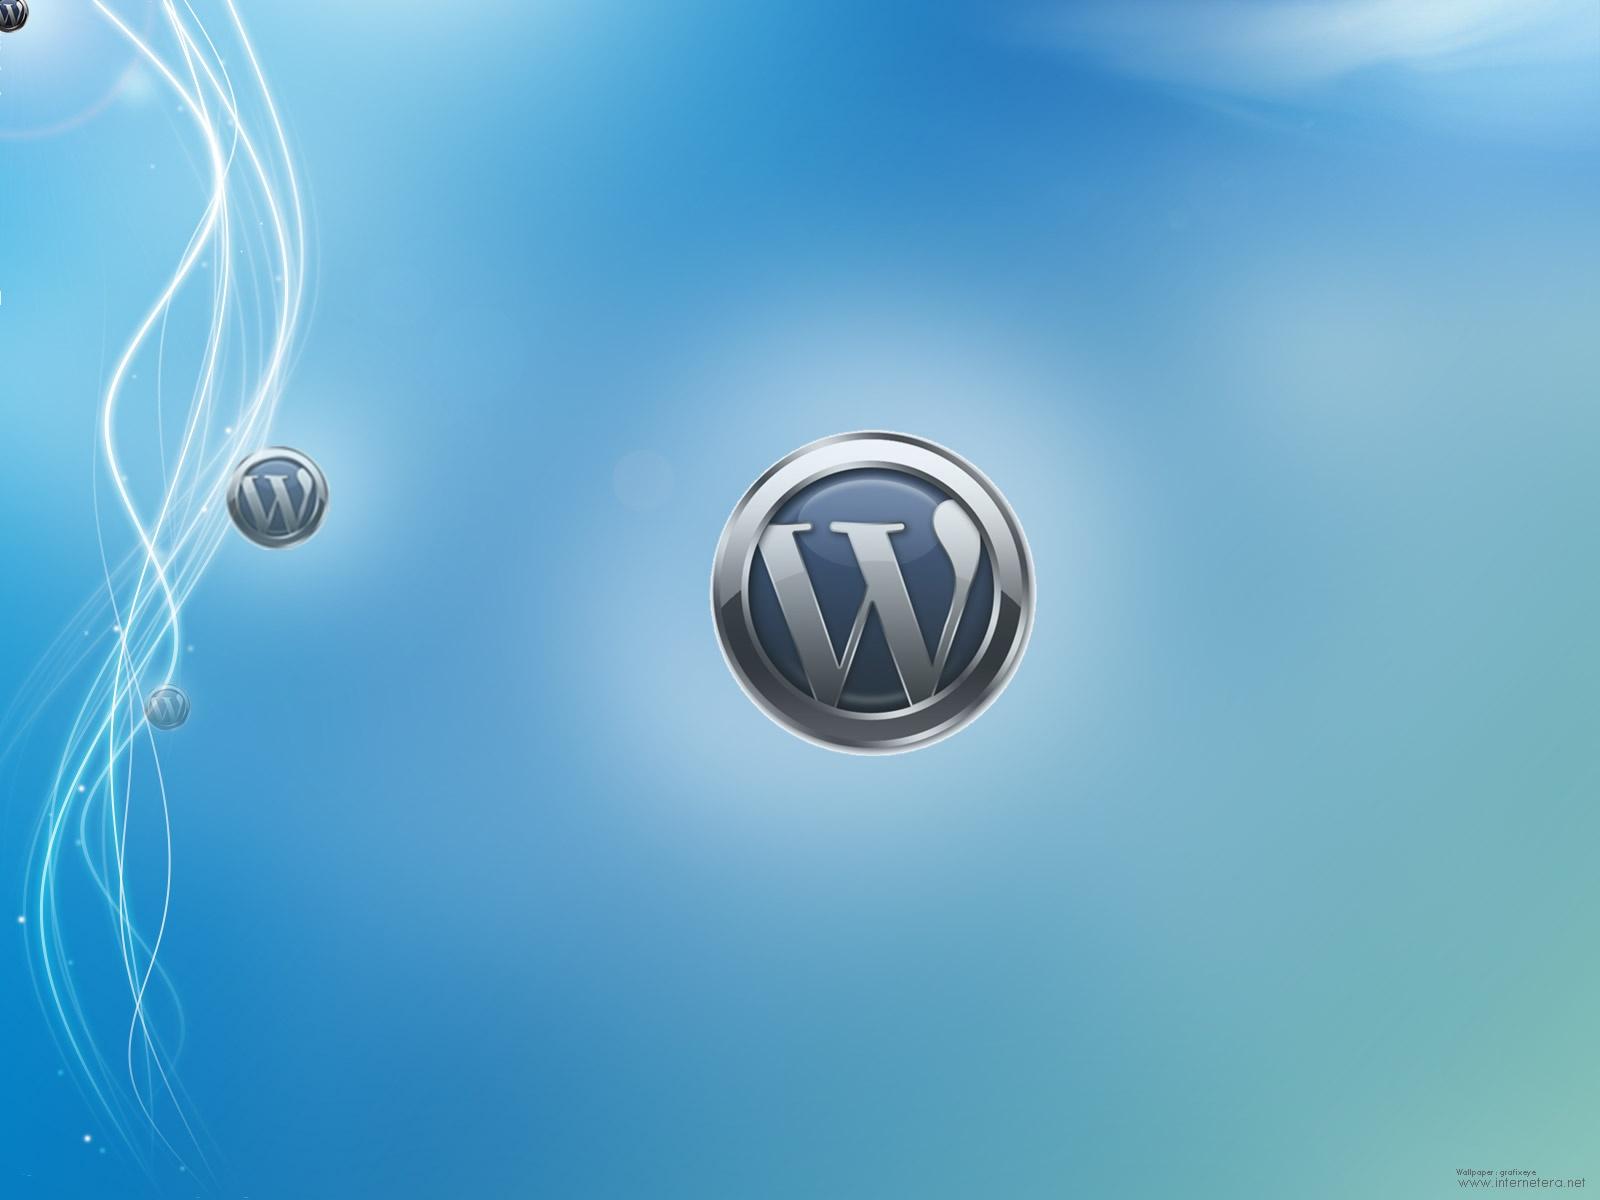 Create Wordpress Wallpaper